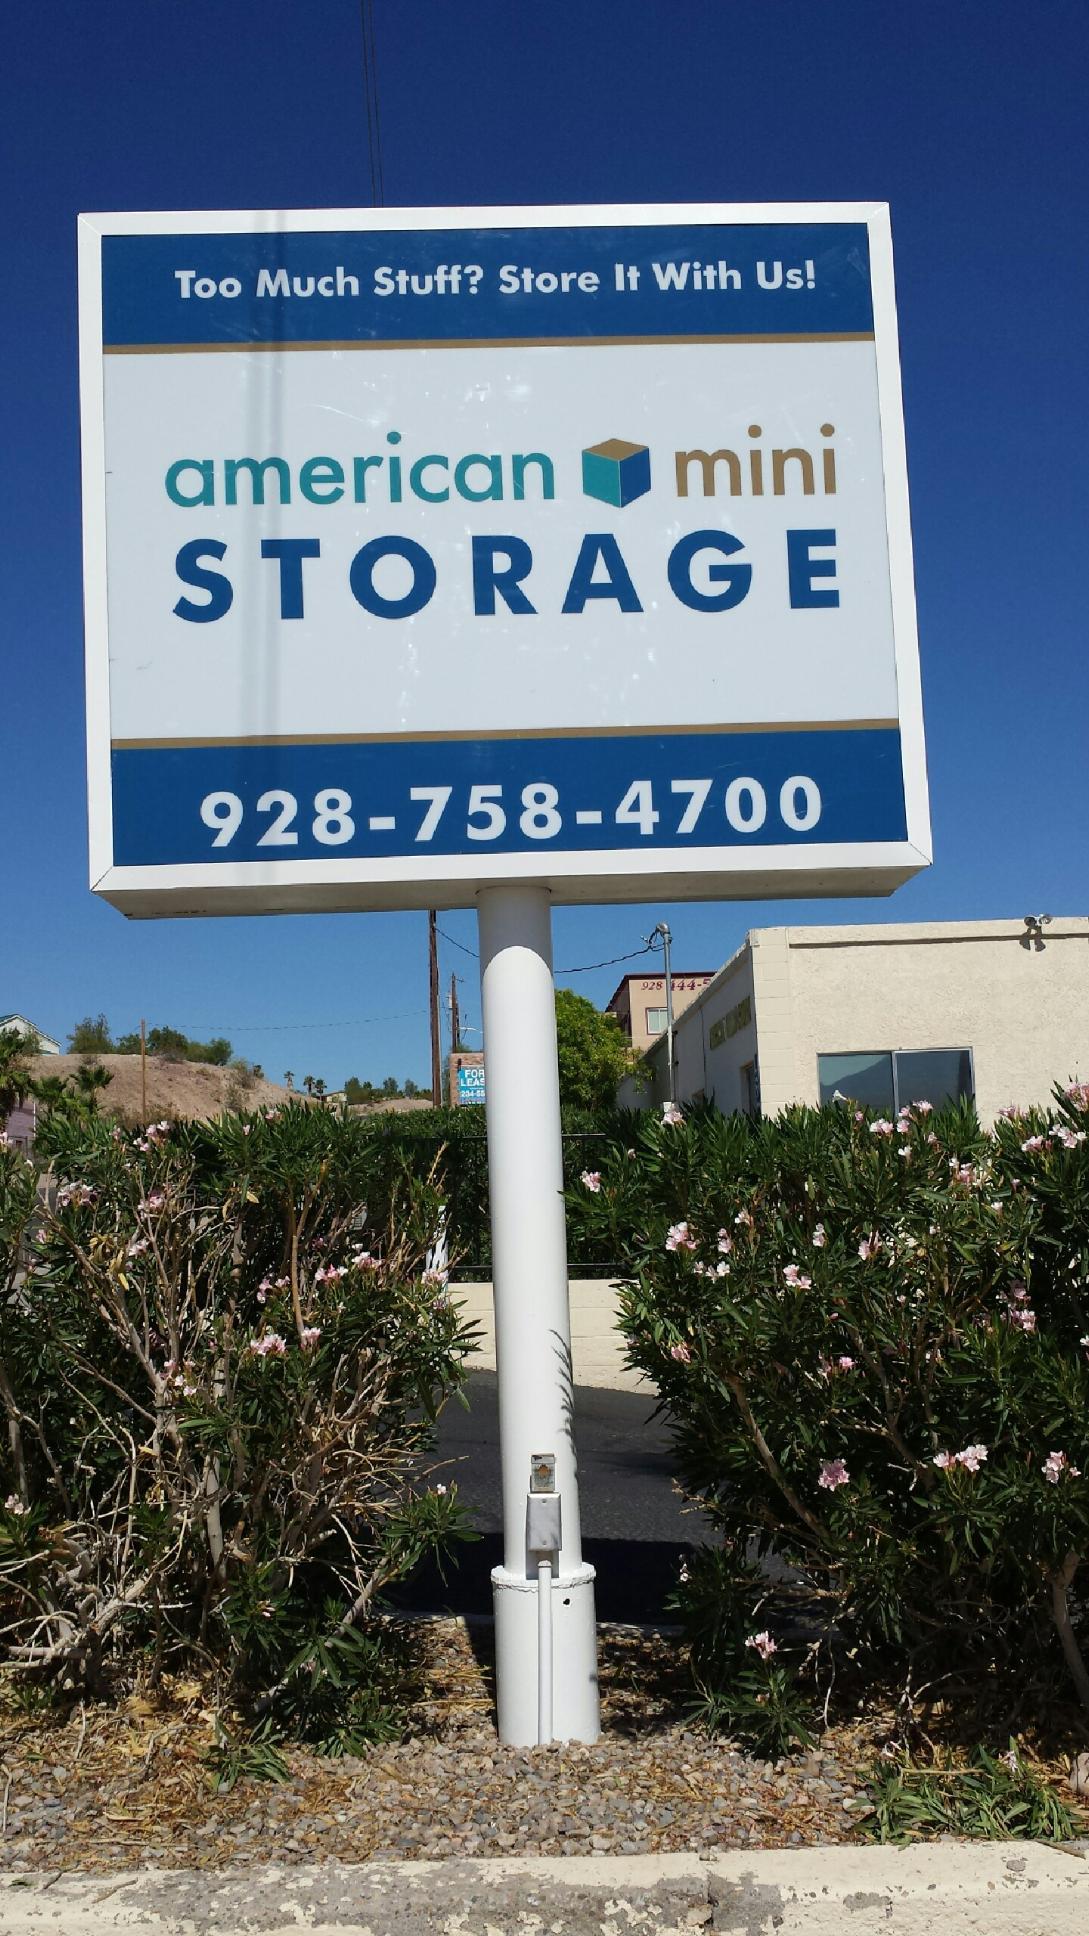 Attirant American Mini Storage 1596 Riverview Dr, Bullhead City, AZ 86442   YP.com